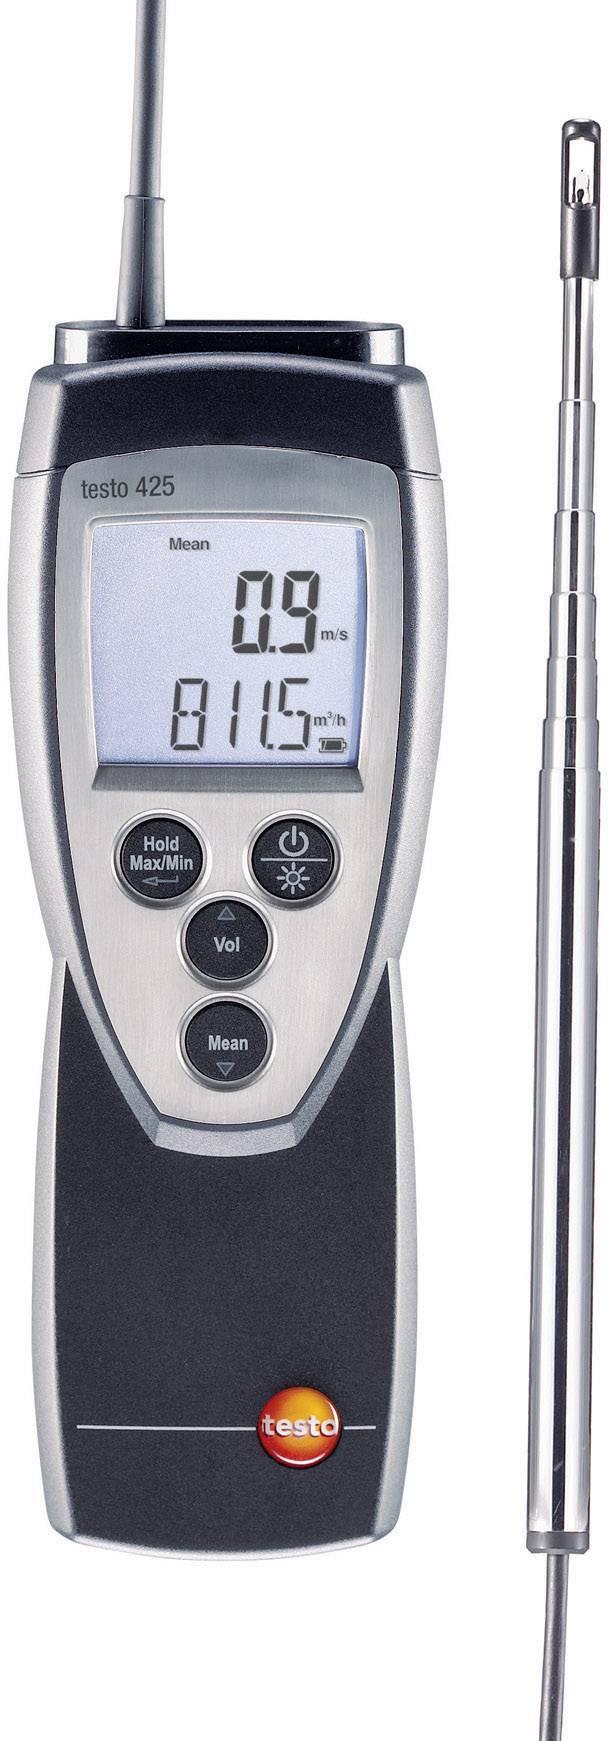 Tepelný anemometr testo 425, kalibrováno dle ISO